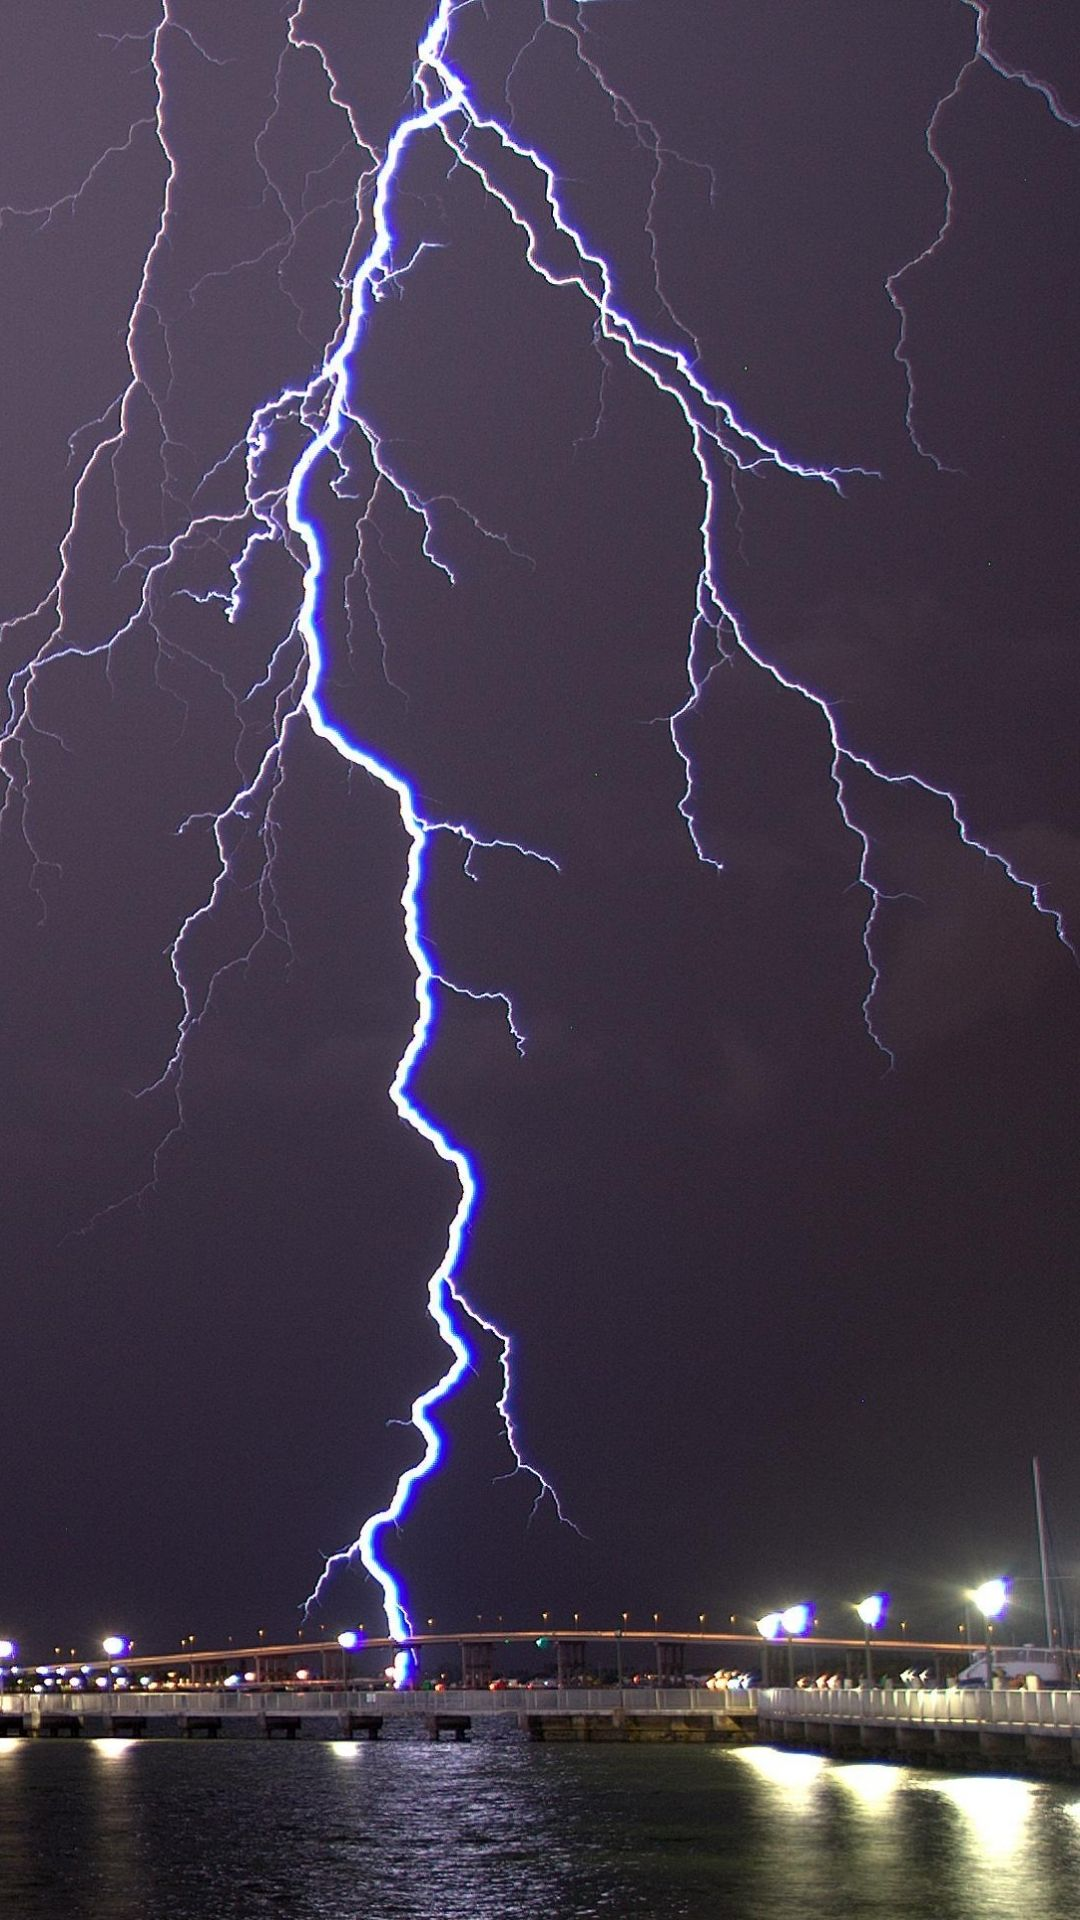 Lightning wallpapers top free lightning backgrounds - Lighting strike wallpaper ...